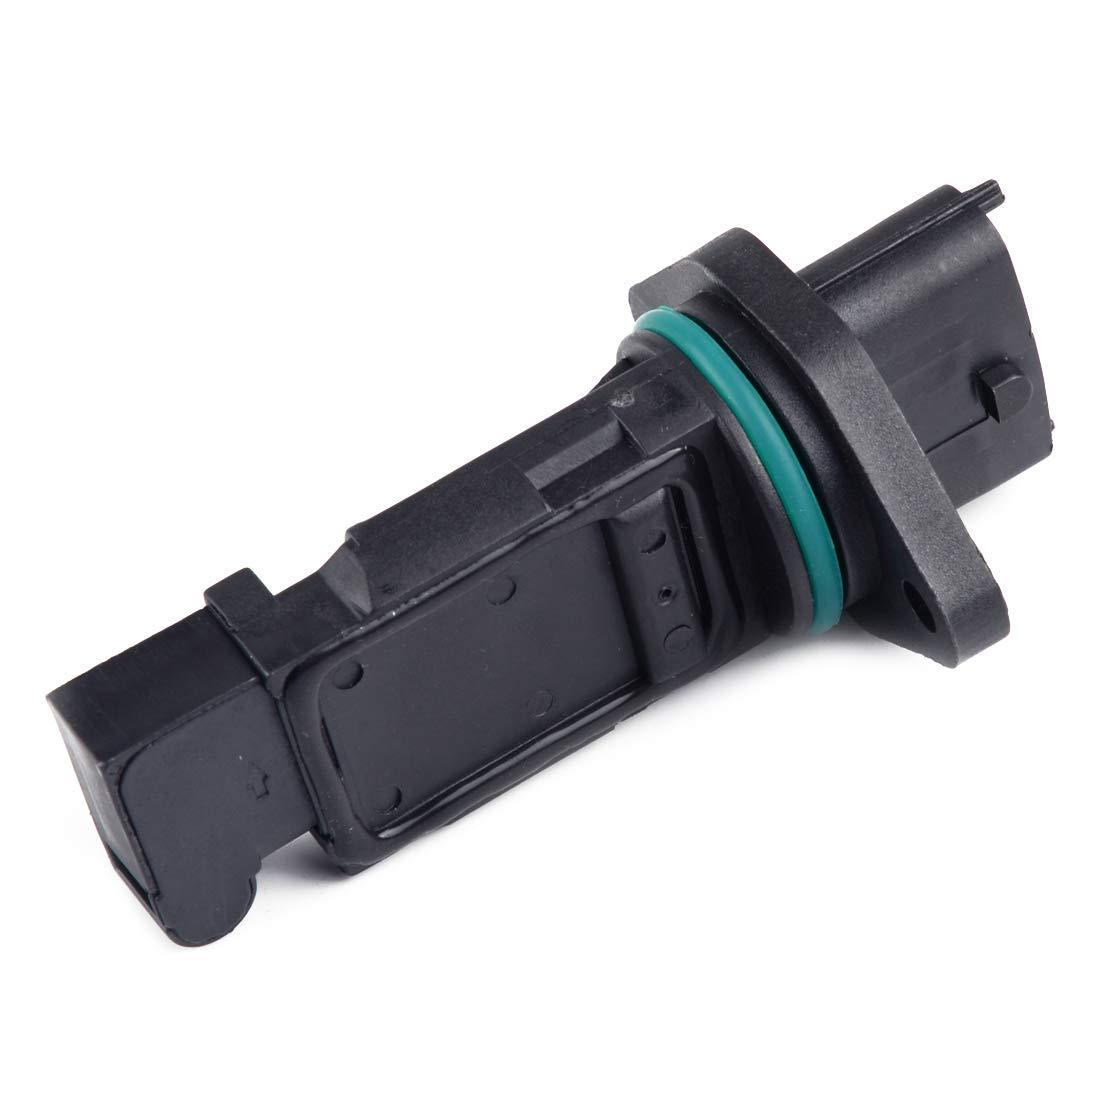 MAF Mass Air Flow Sensor Meter Fit for Volvo C70 S60 S80 V70 XC90 T5 T6 0280218088 0280218088 N